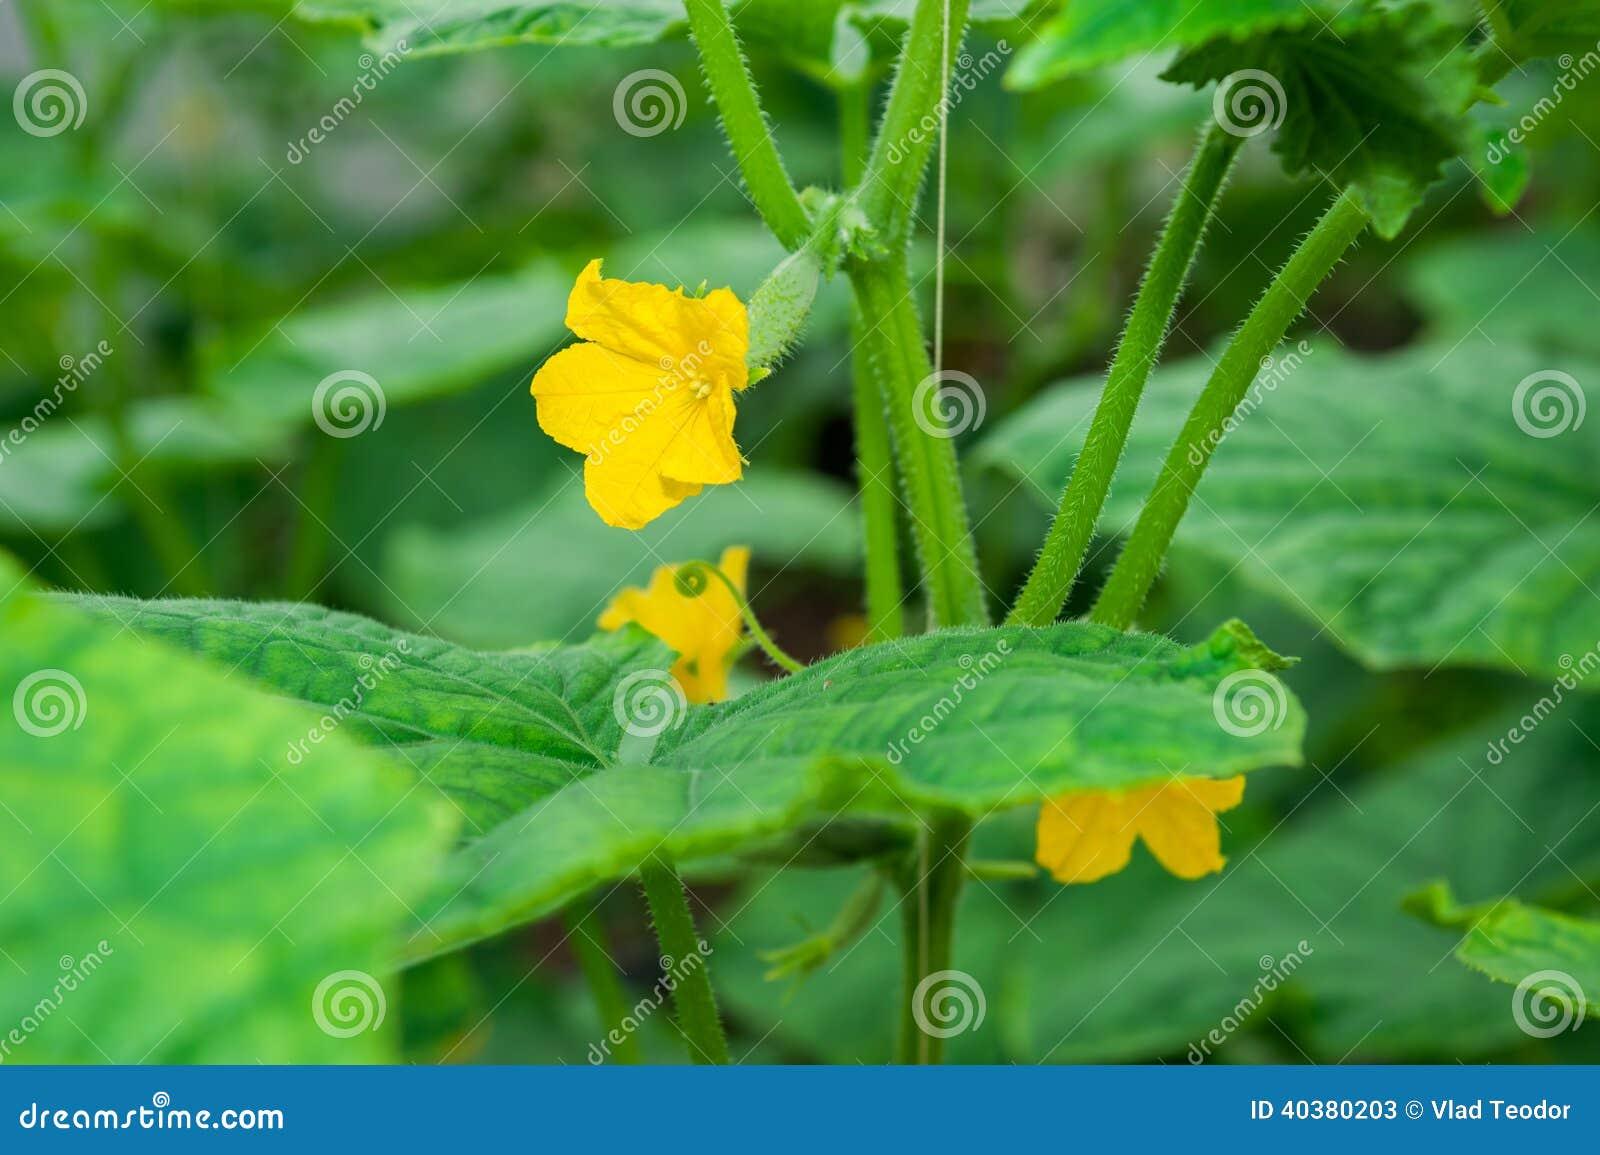 Cucumber Plant Yellow Flower Stock Image Image Of Background